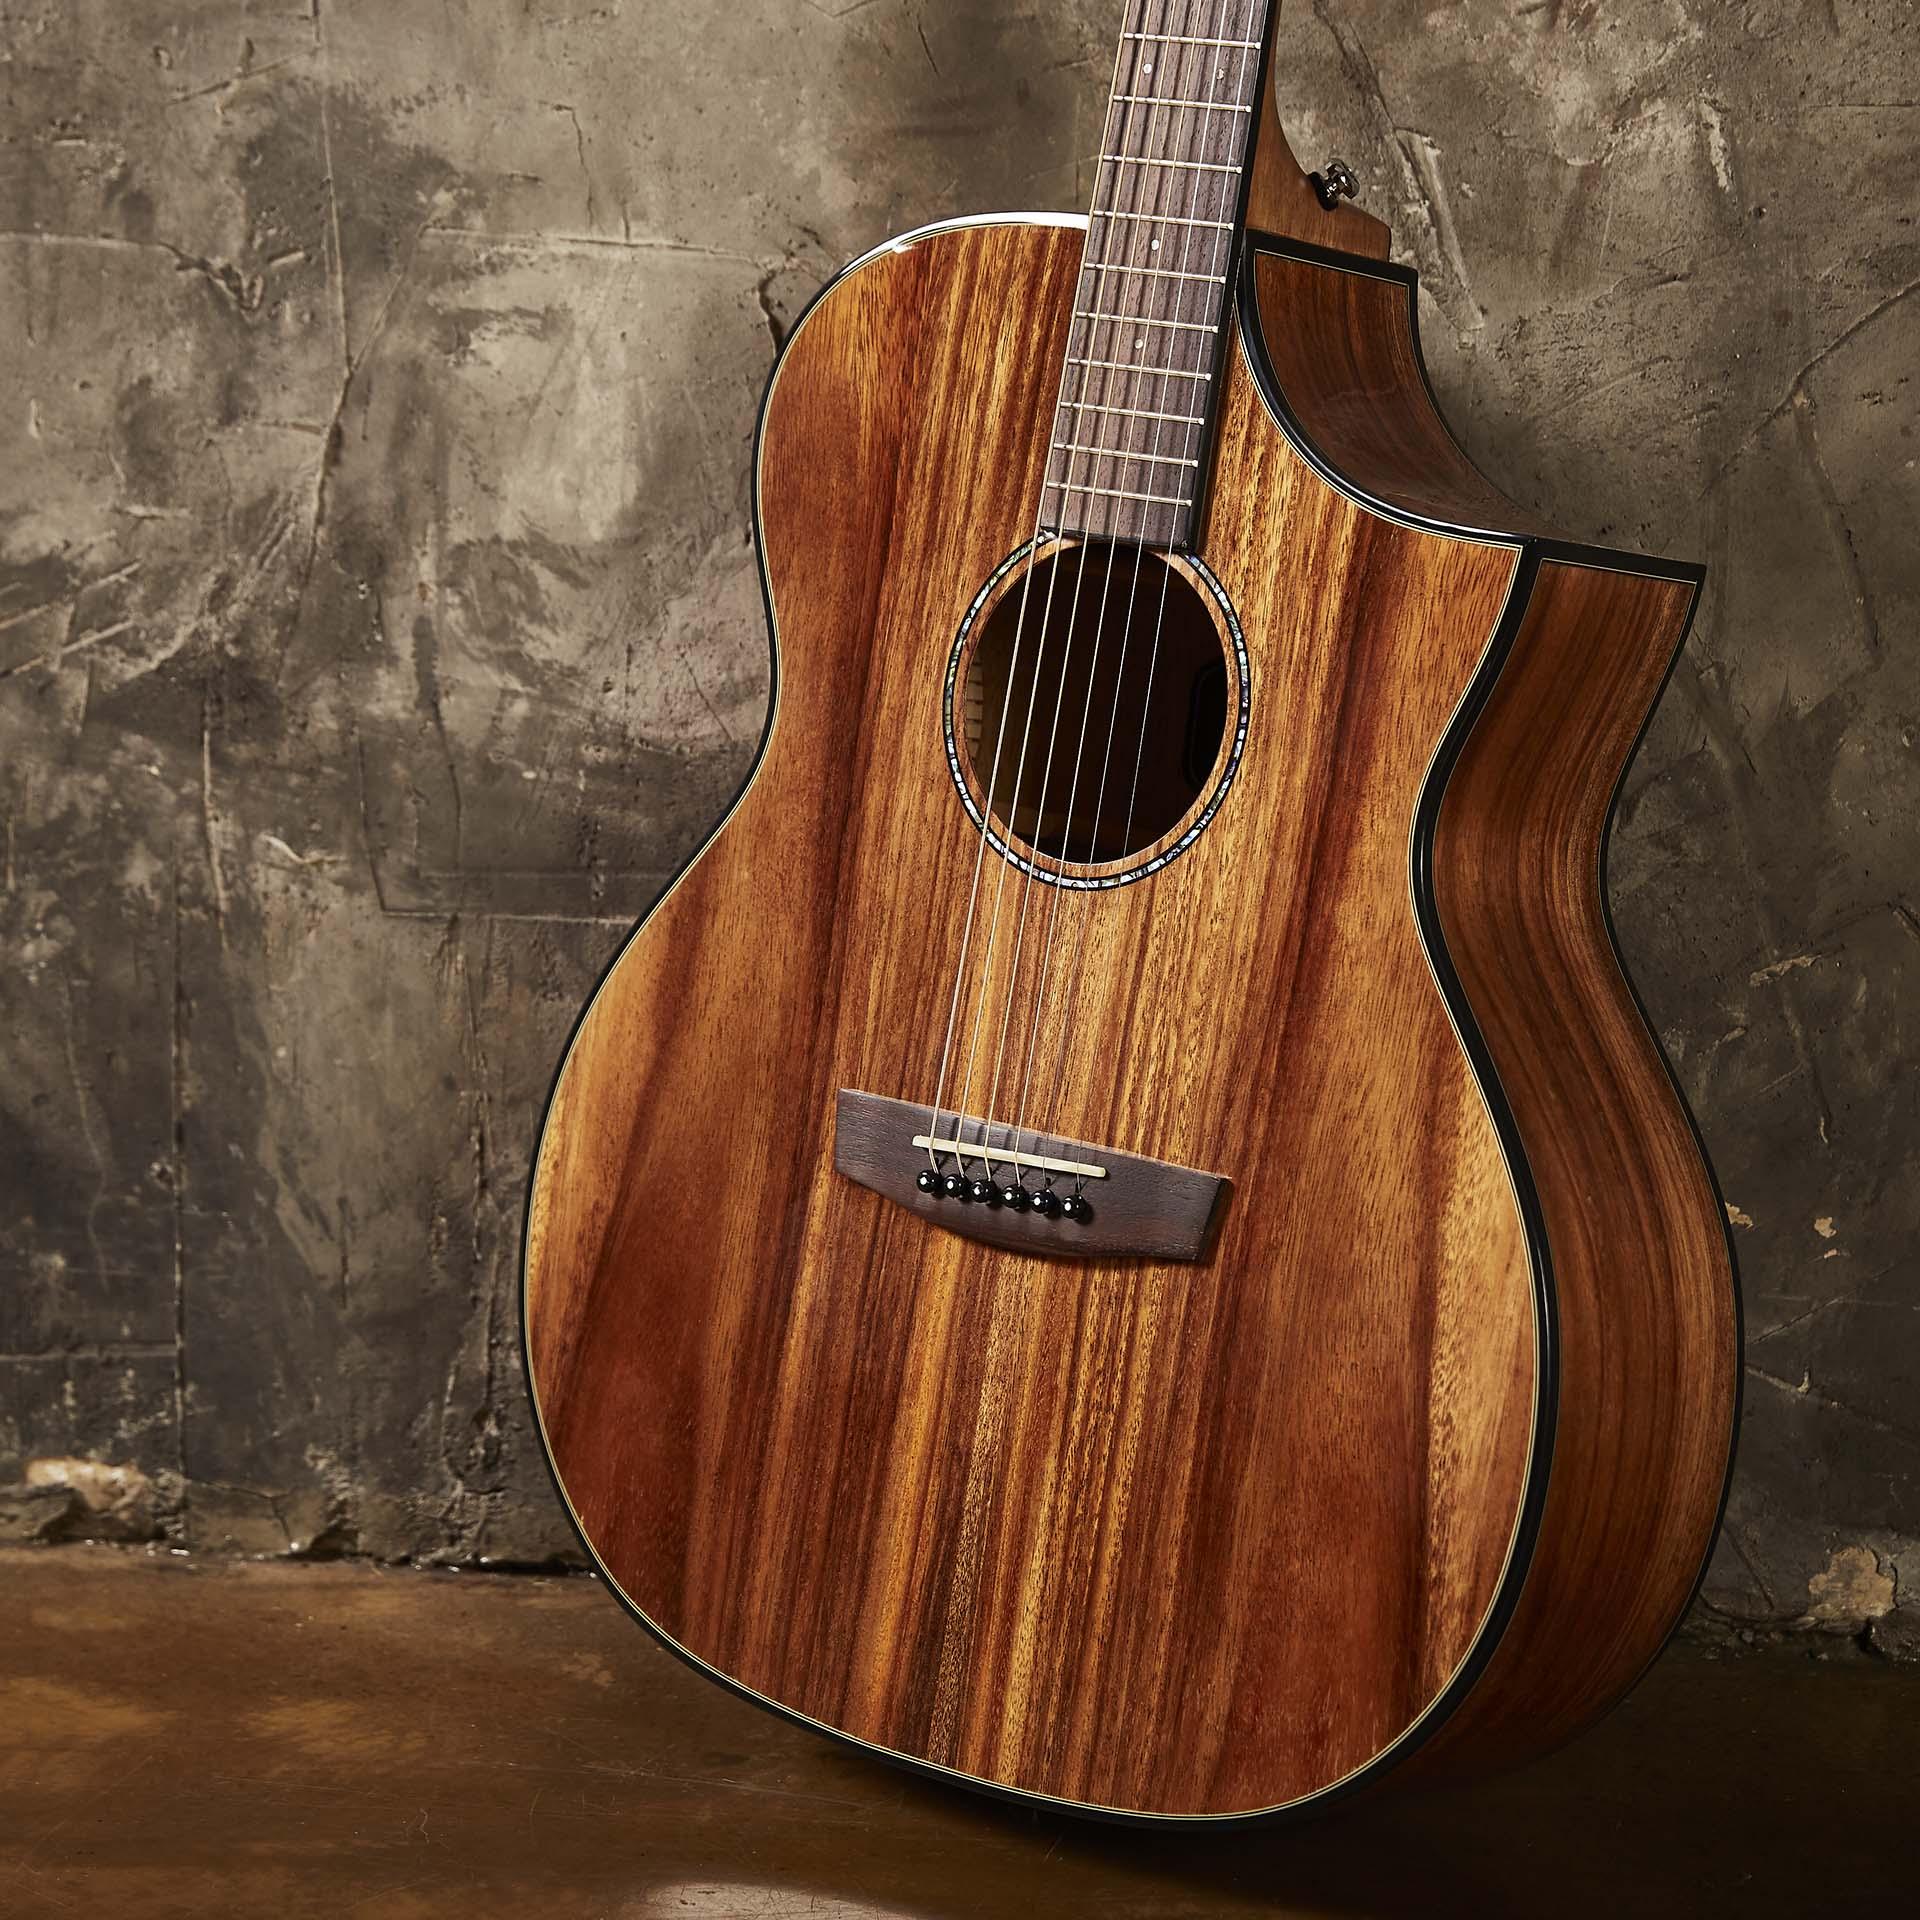 Đàn Guitar Acoustic HEX FX240C